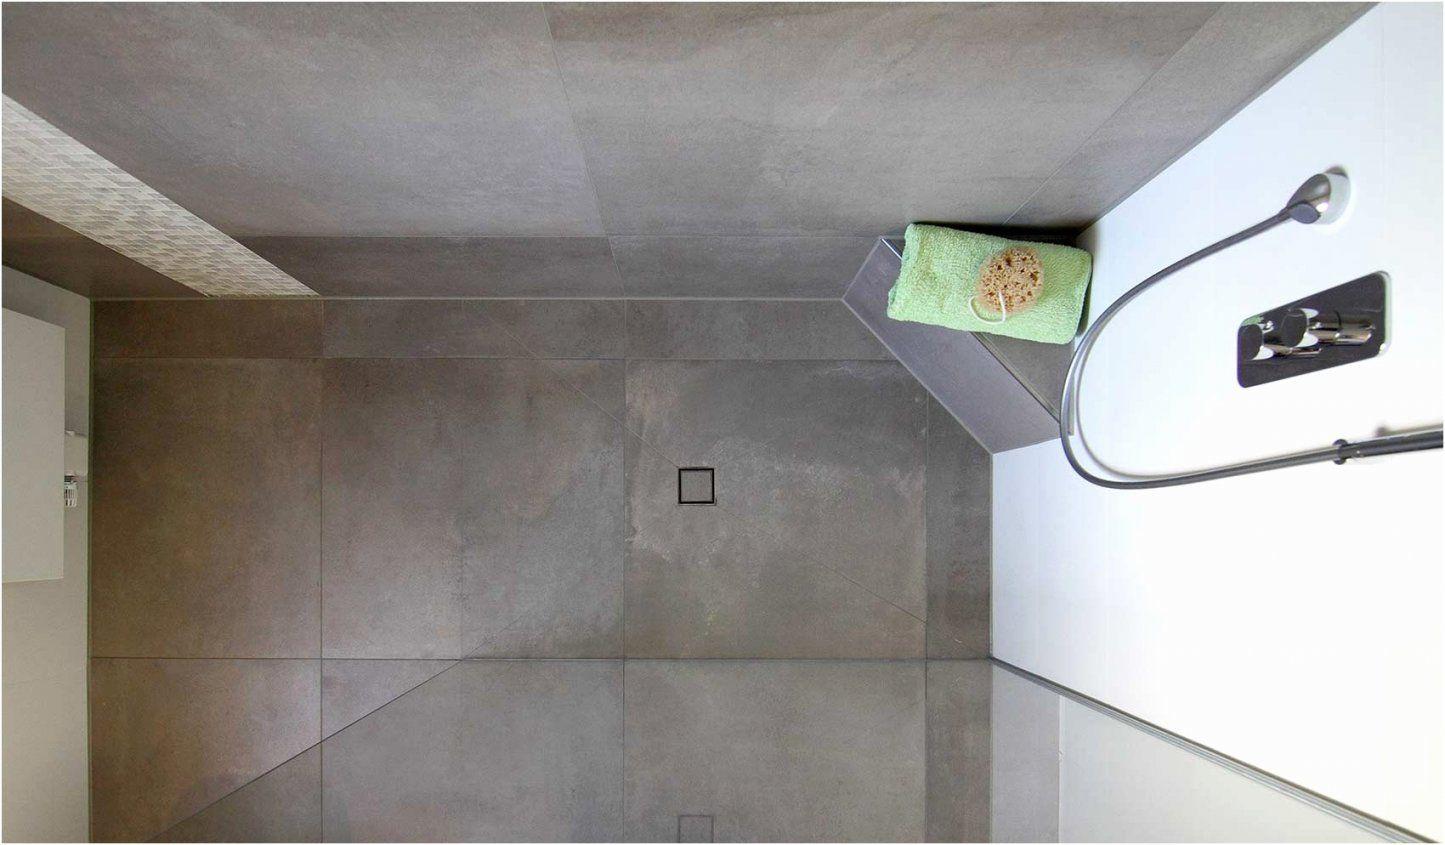 Dusche Ebenerdig Selber Bauen Luxus Sitzbank Dusche Selber Bauen von Sitzbank Dusche Selber Bauen Photo